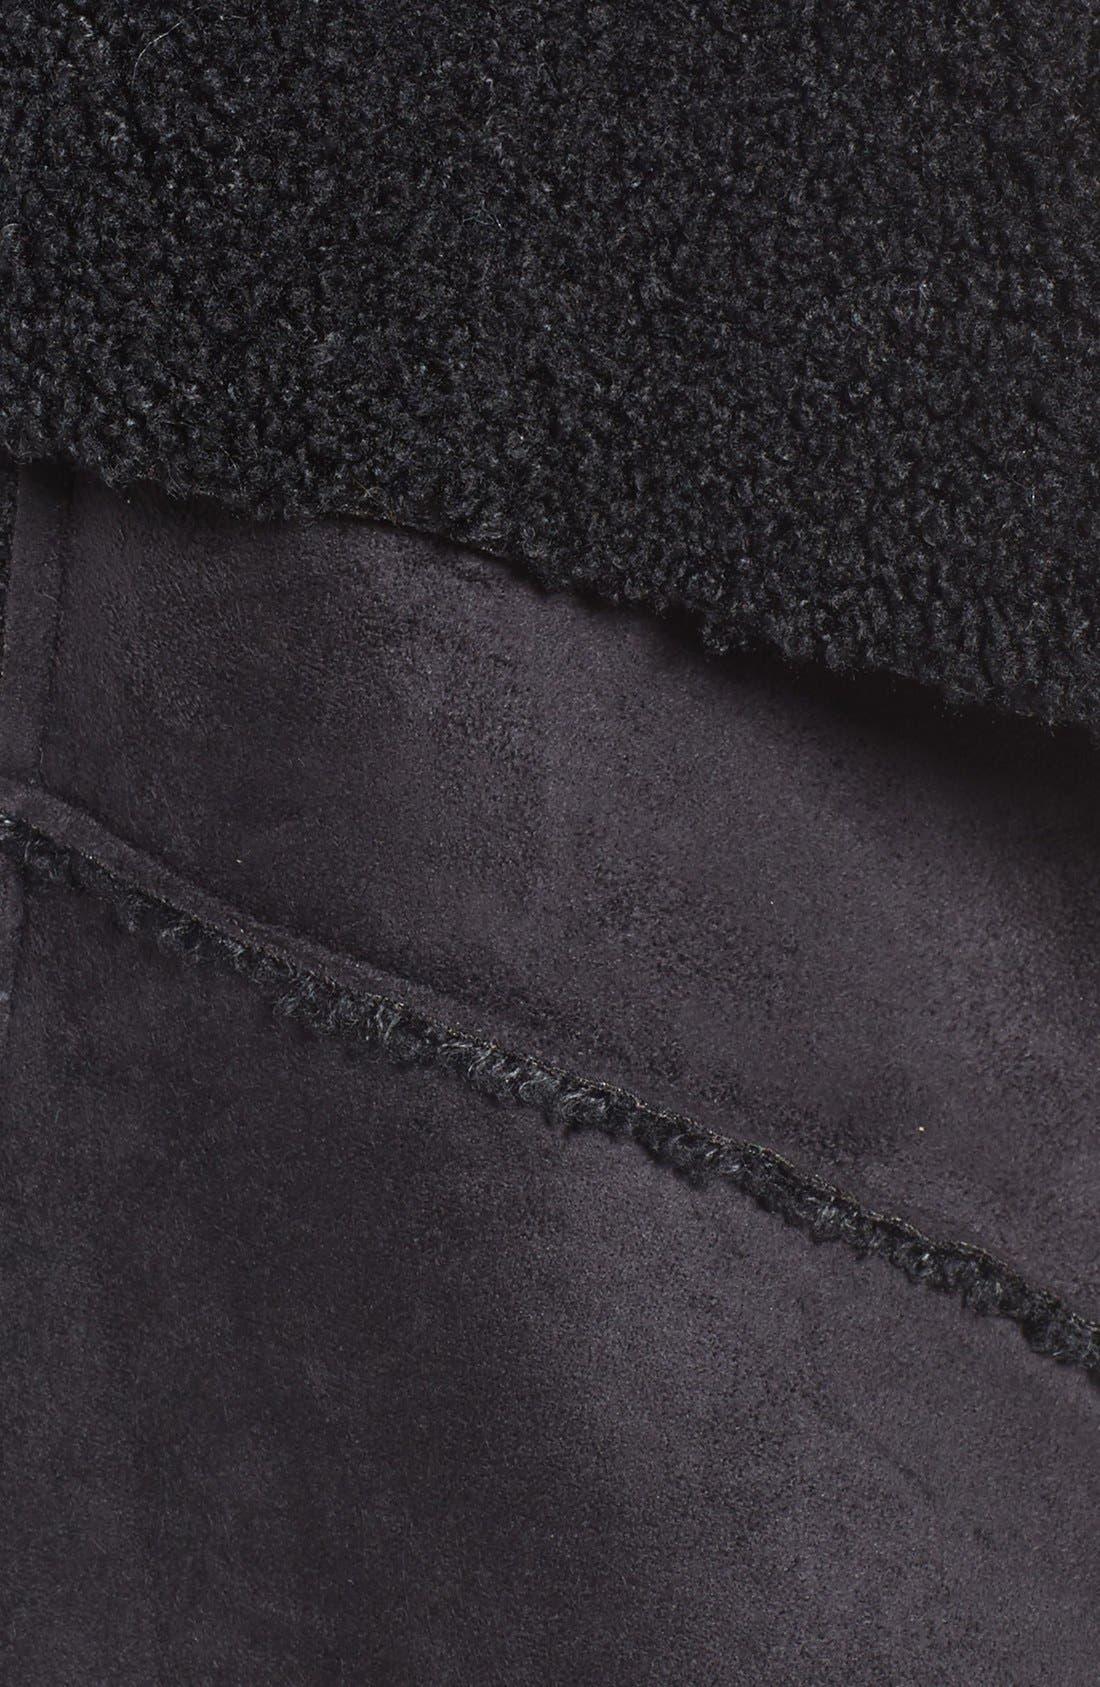 Goslett Faux Shearling Vest,                             Alternate thumbnail 5, color,                             001